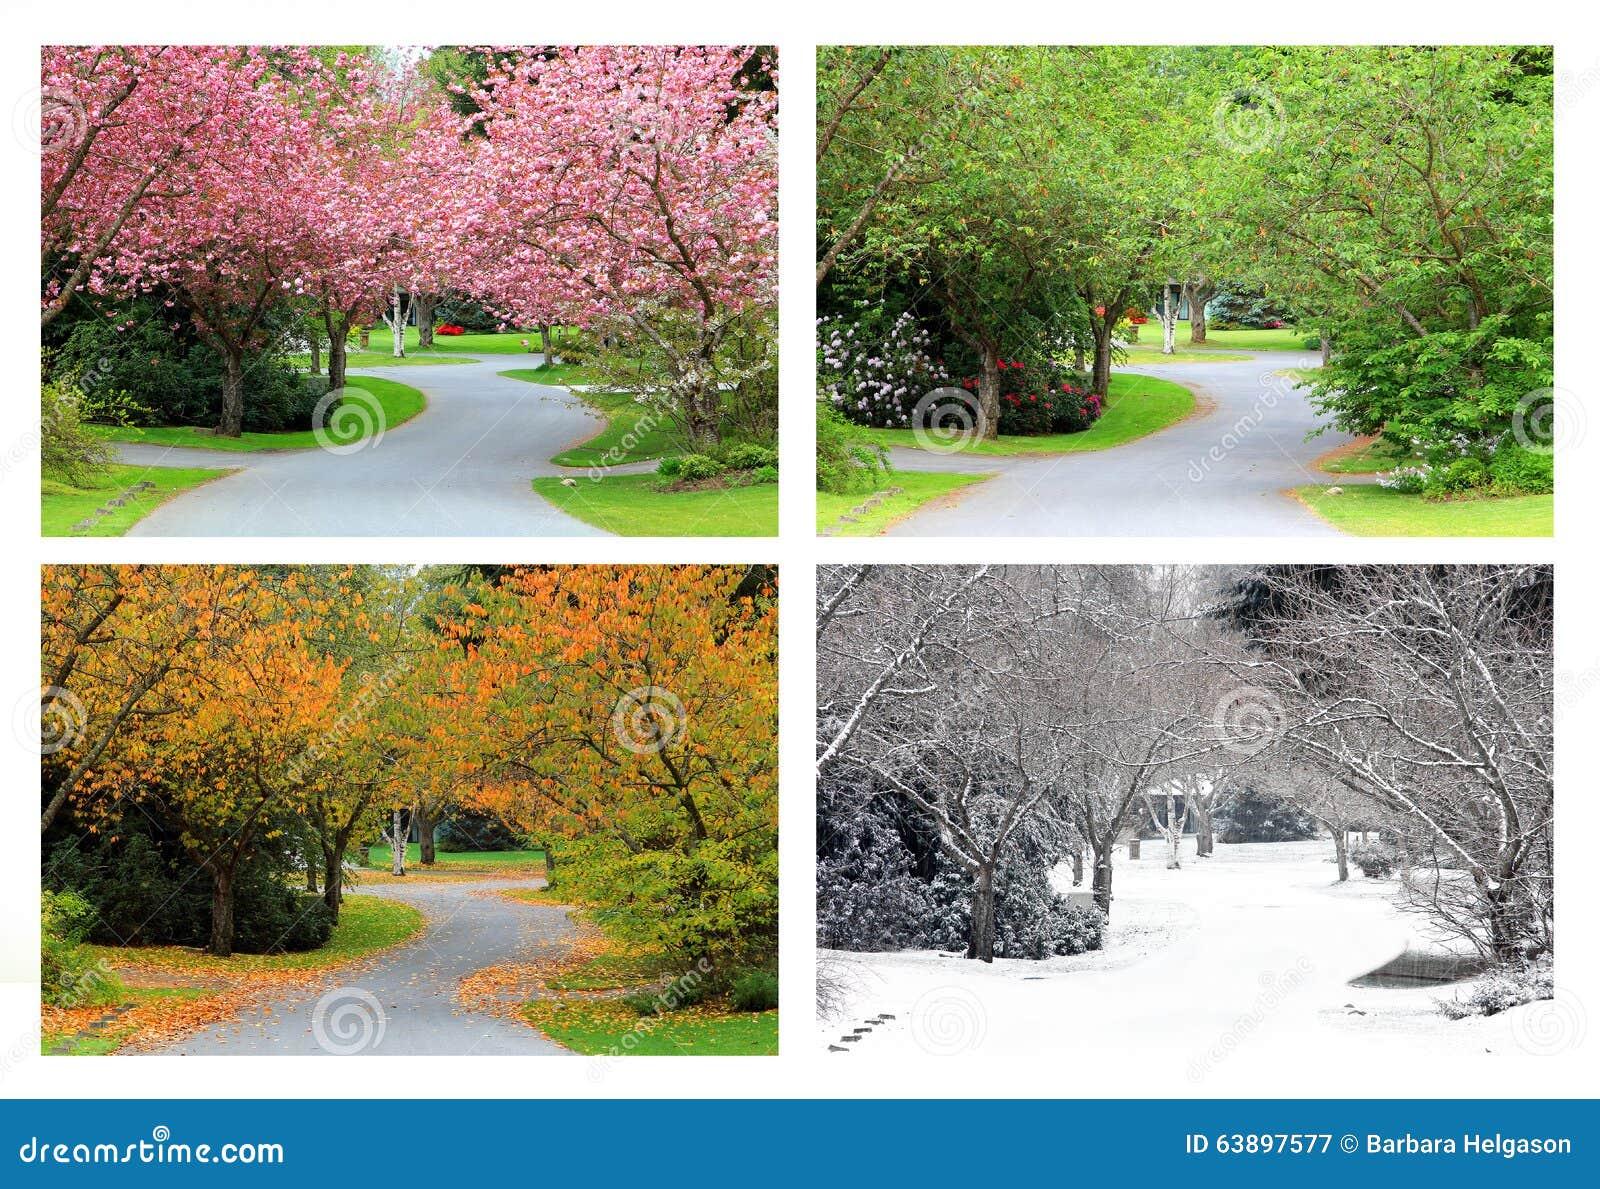 Four seasons of cherry trees on the same street.